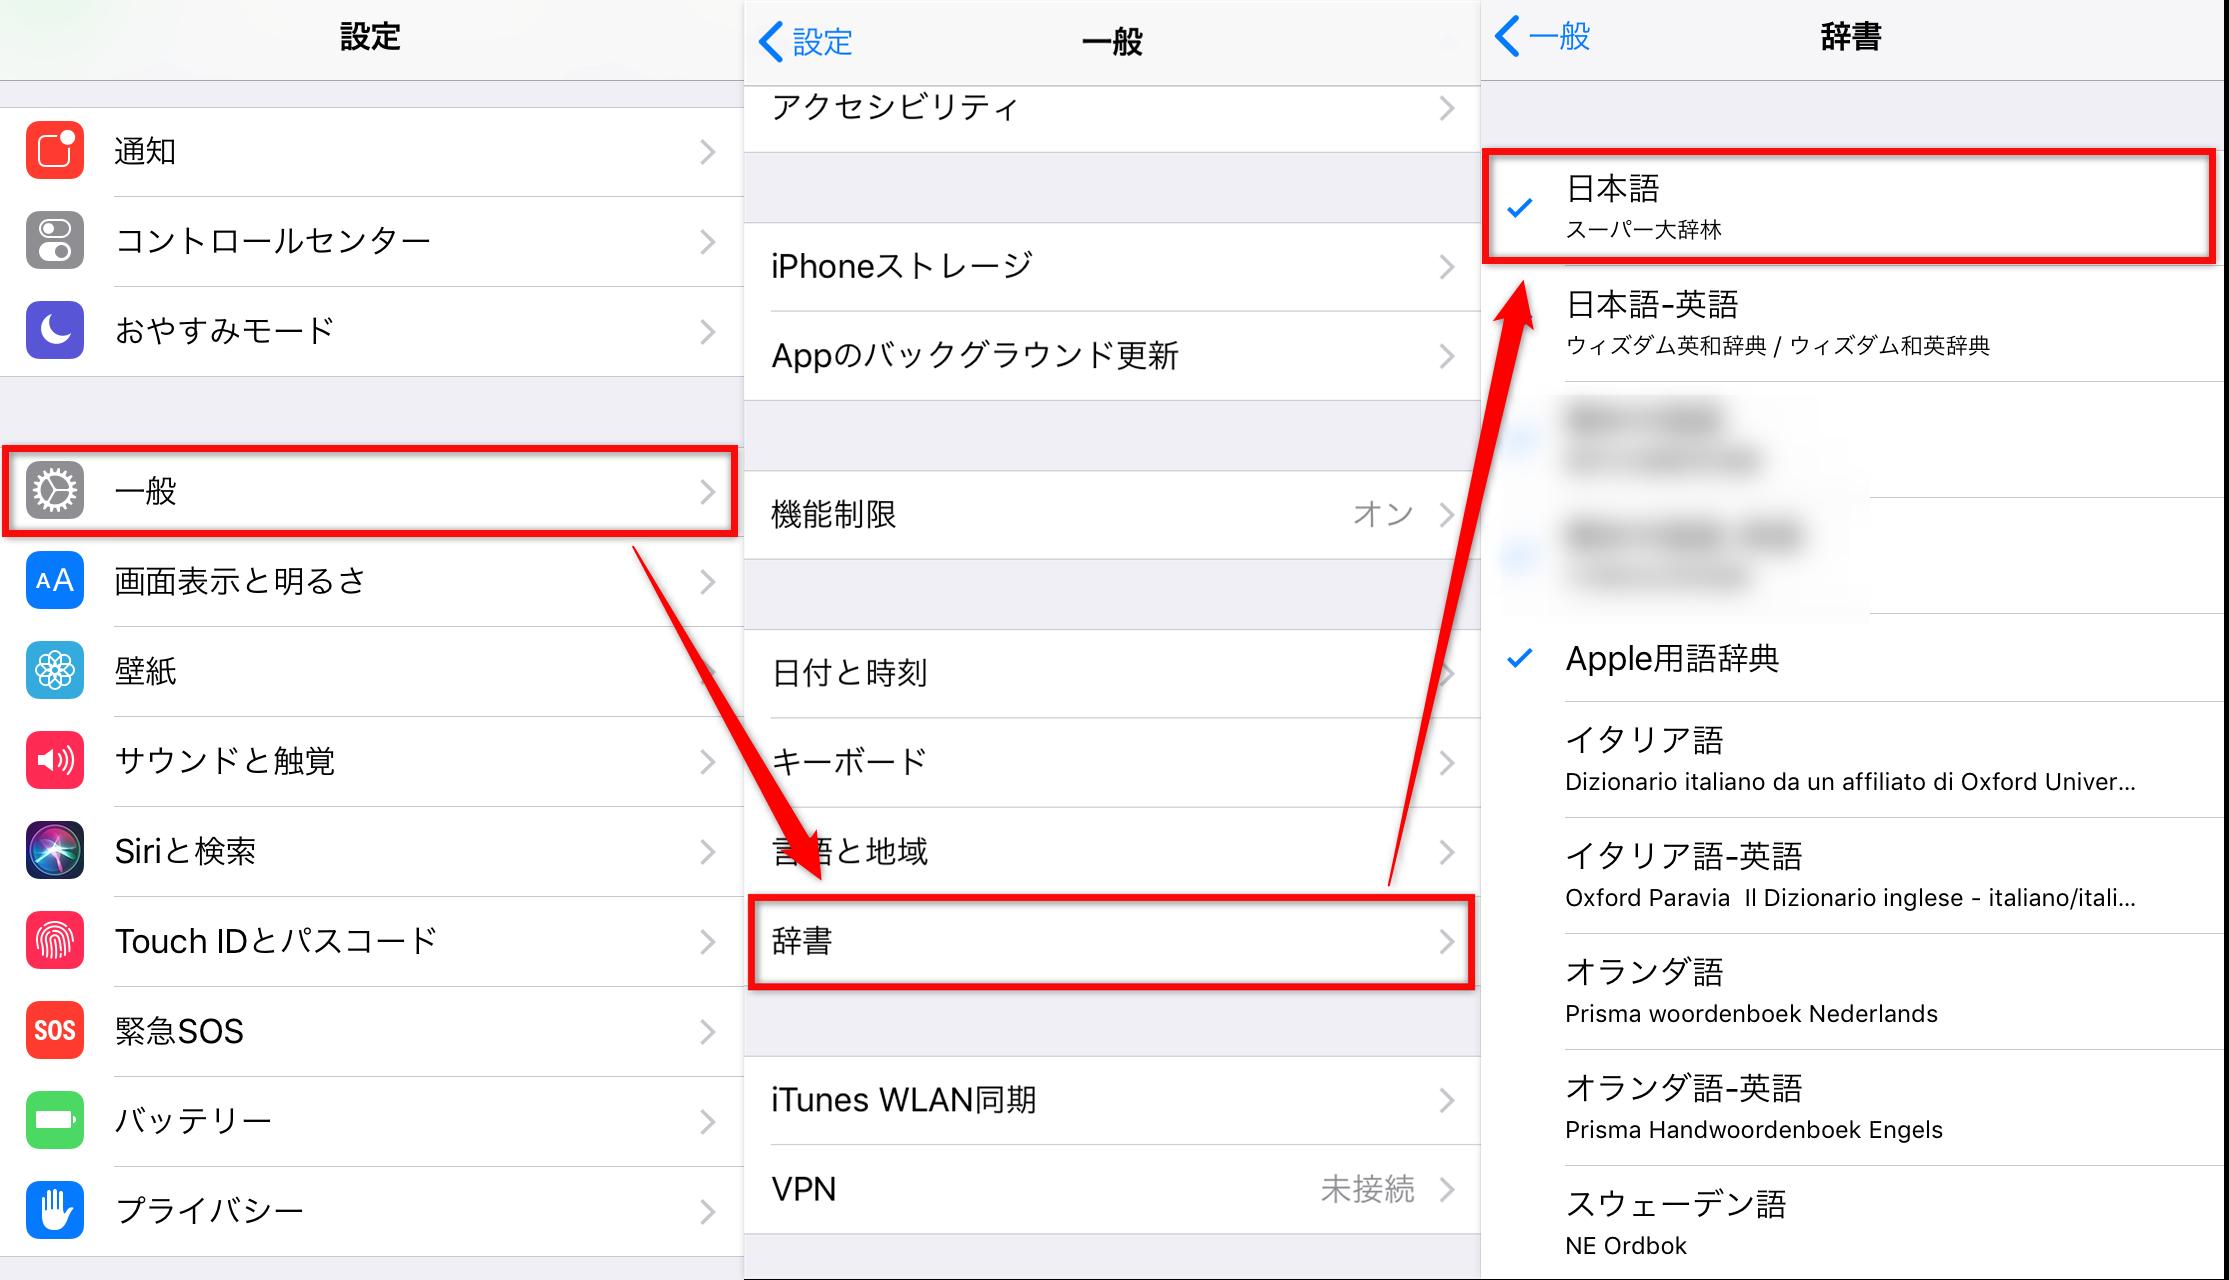 iOS 12.3・iOS 12.2・iOS 12.1・iOS 12バージョンアップによるバグ・不具合 - 辞書機能が使えない